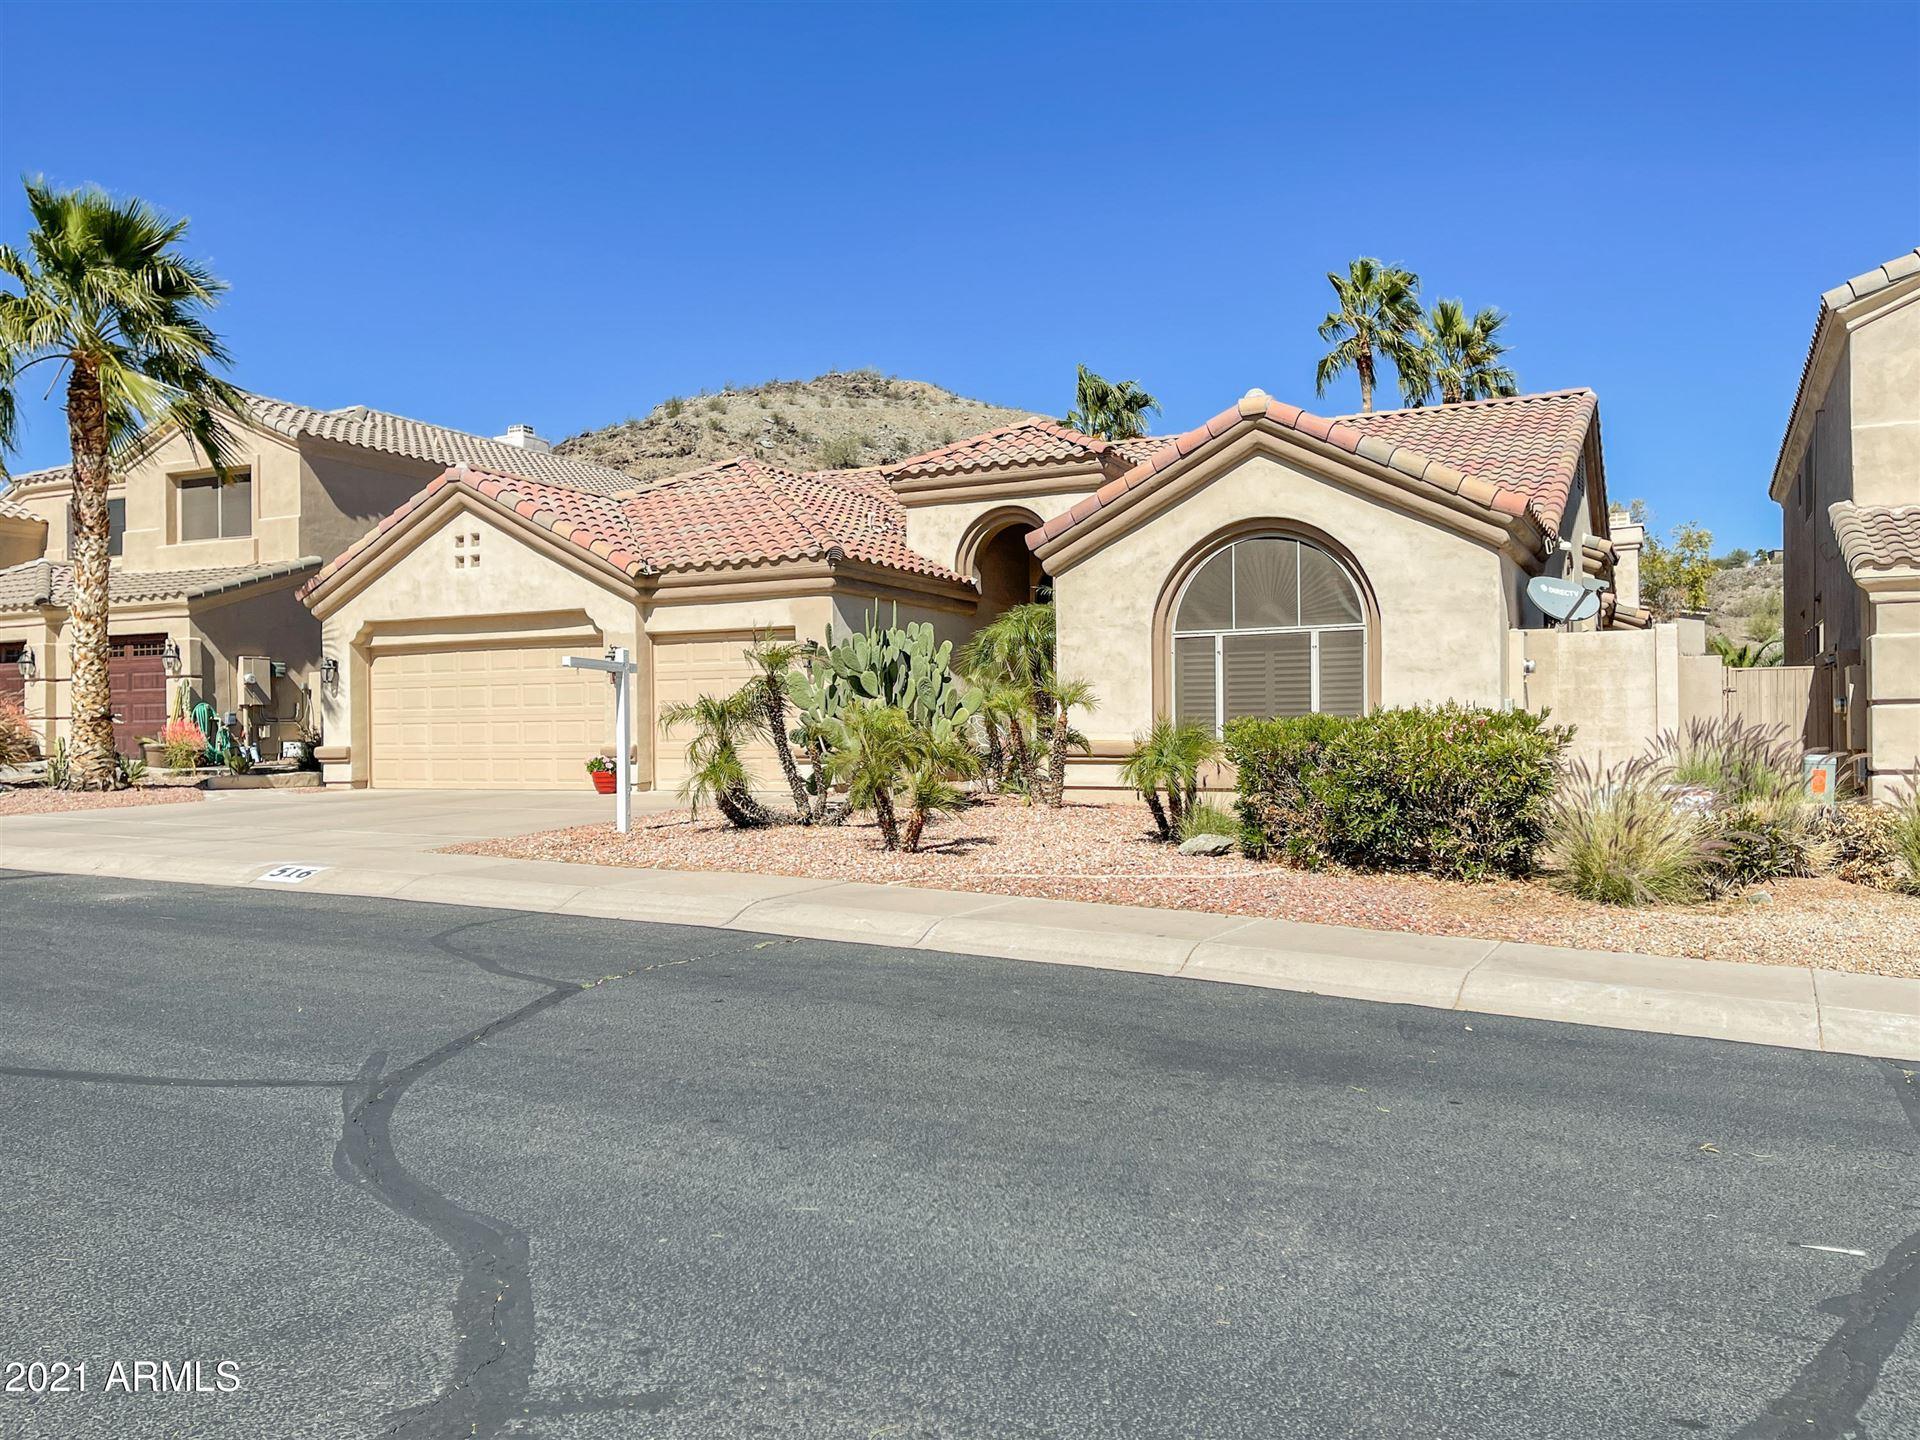 516 E Silverwood Drive, Phoenix, AZ 85048 - MLS#: 6199876